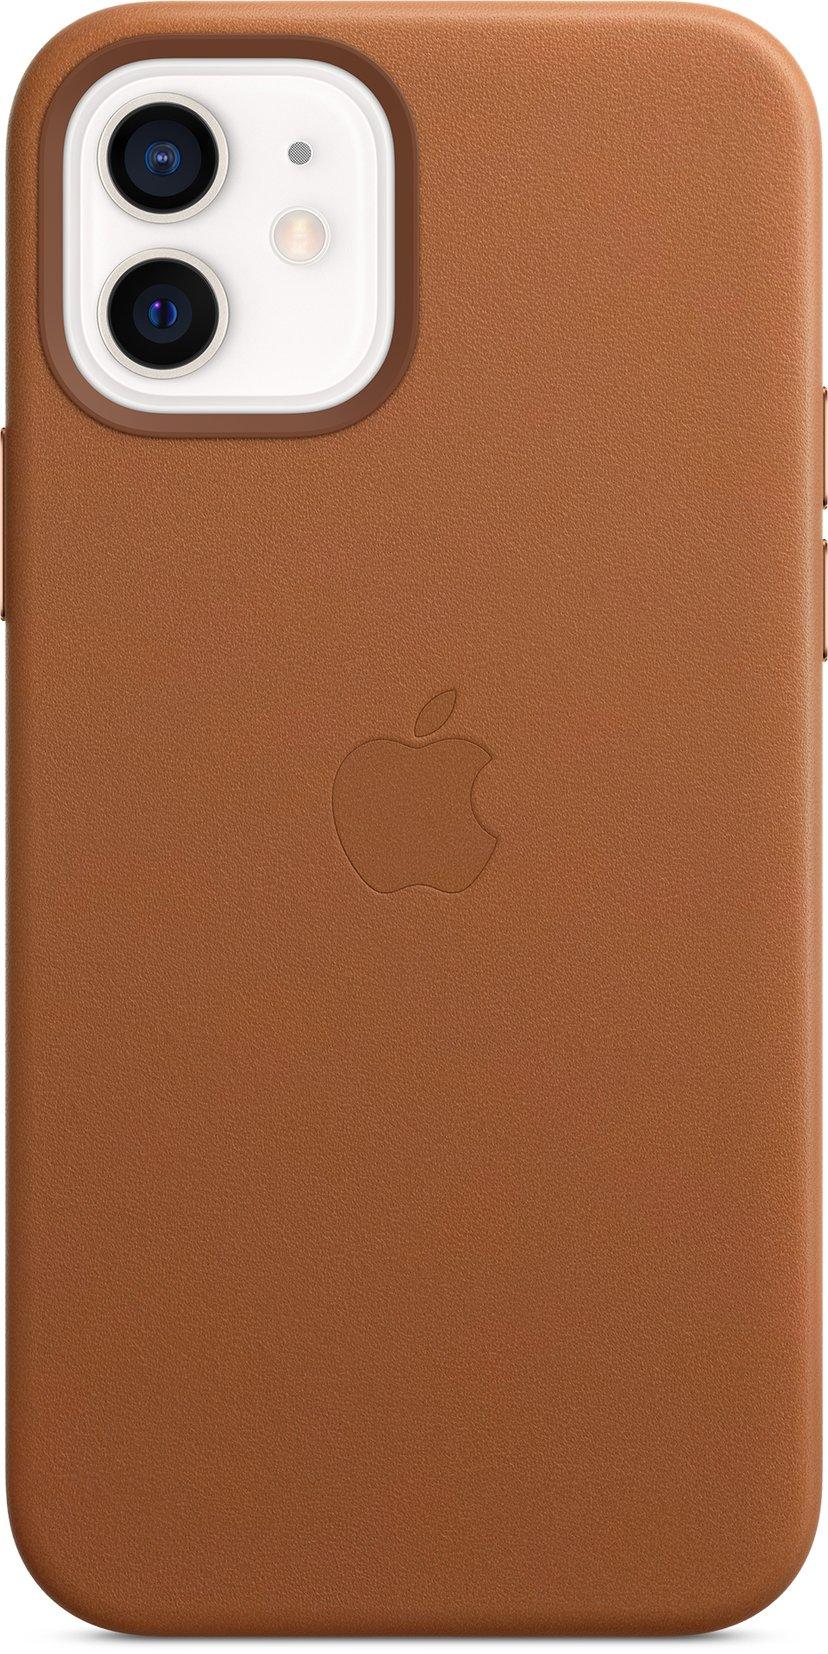 Apple Leather Case with MagSafe iPhone 12, iPhone 12 Pro Sadelbrun